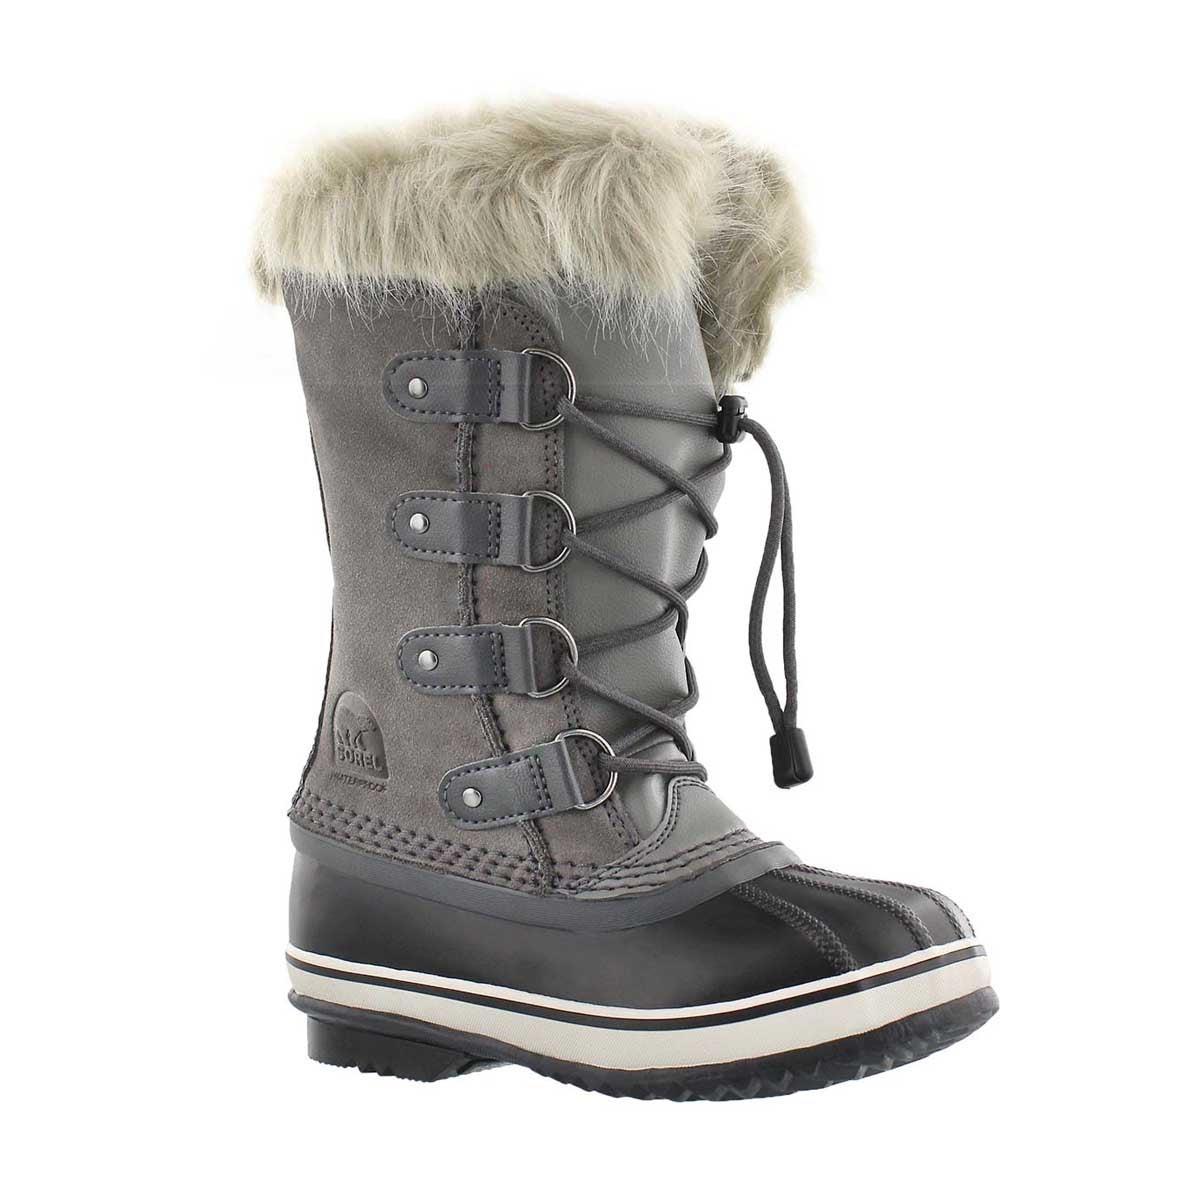 Grls Joan Of Arctic quarry winter boot